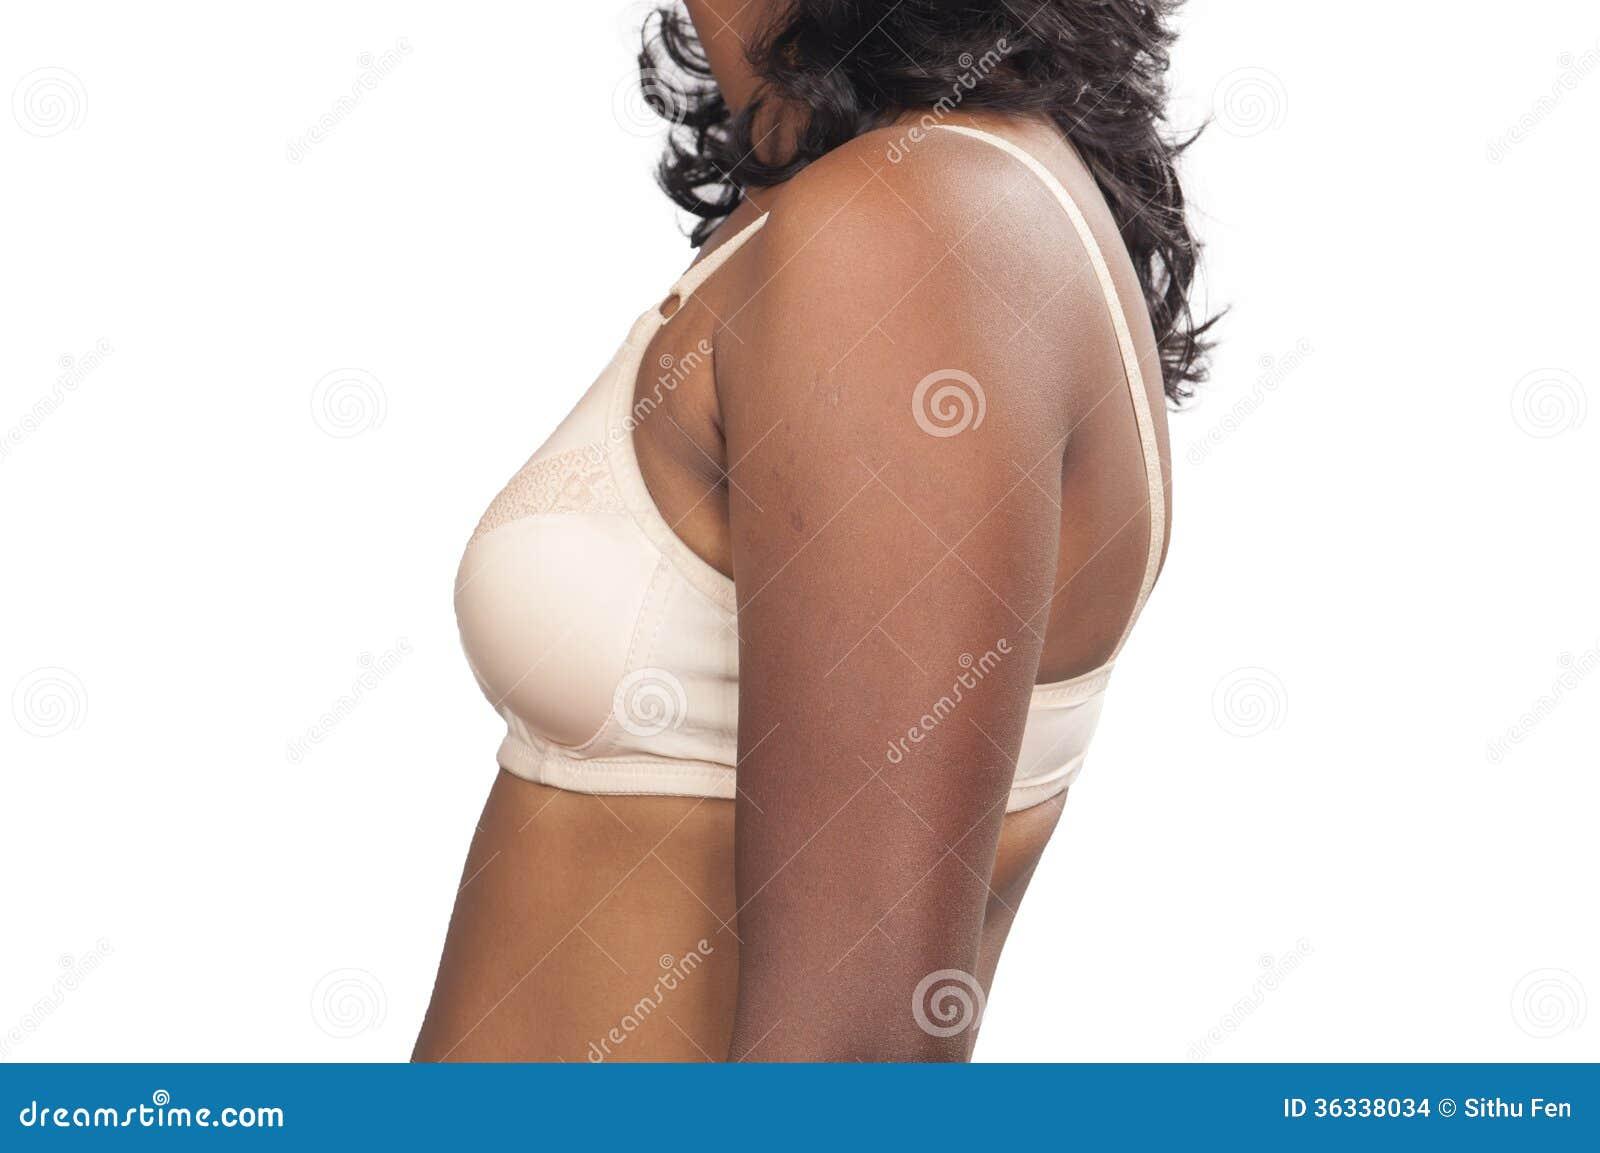 Asian Women Bra Stock Photo Image Of White Srilanka